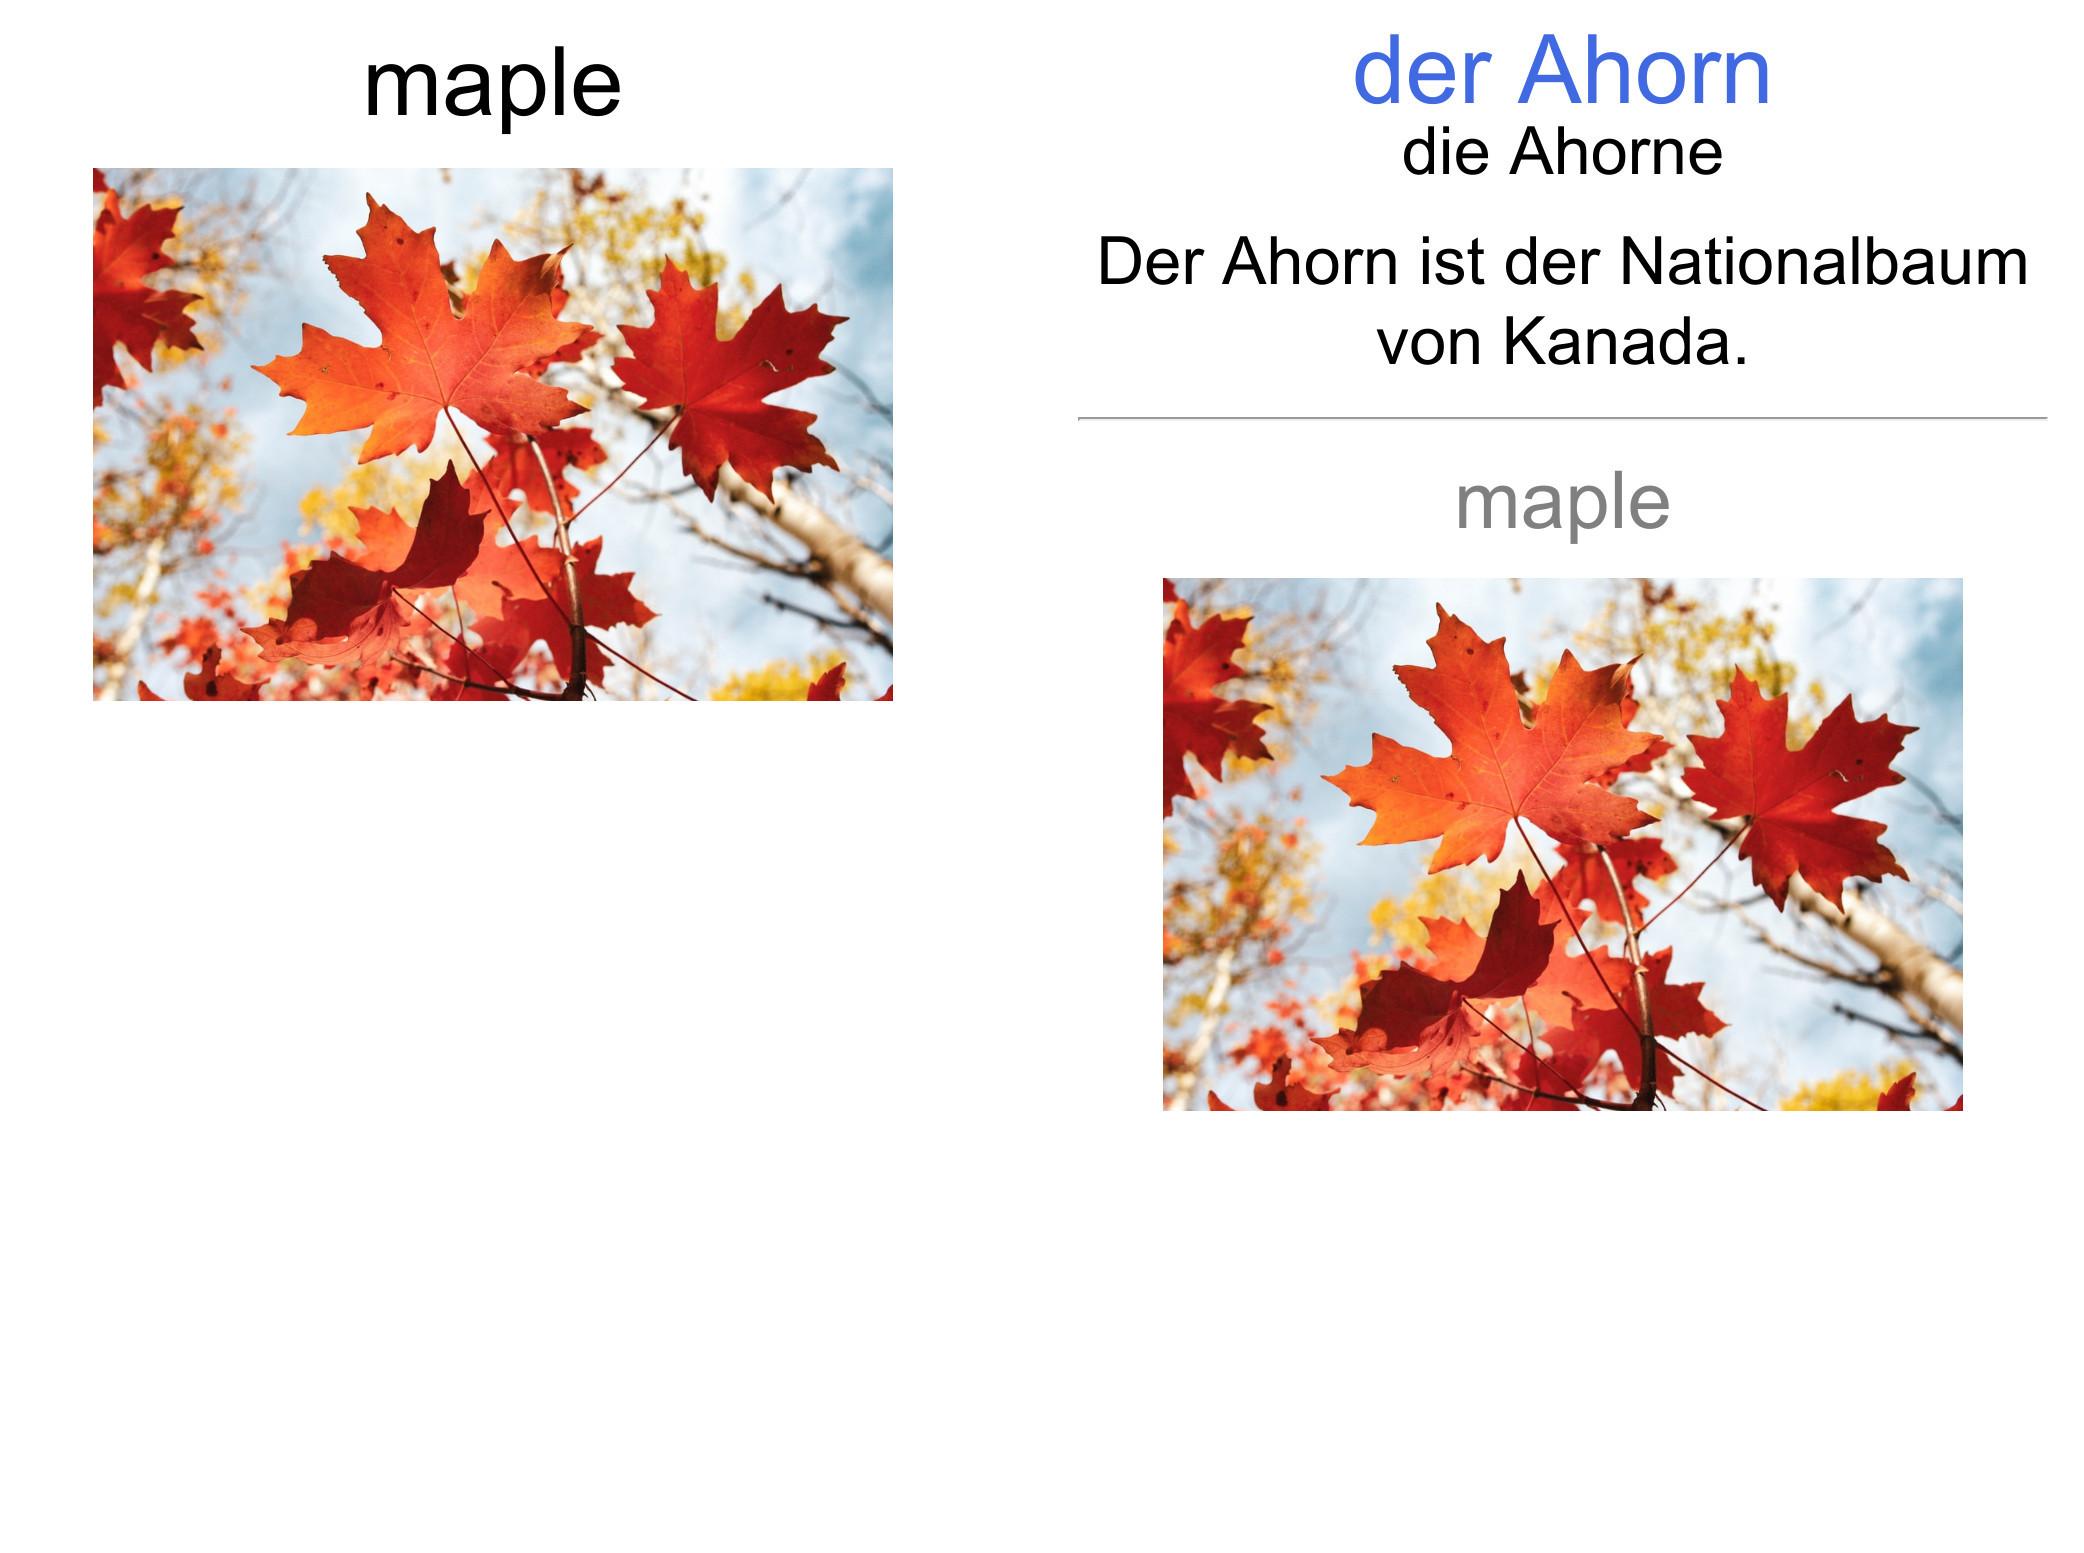 translation to german card